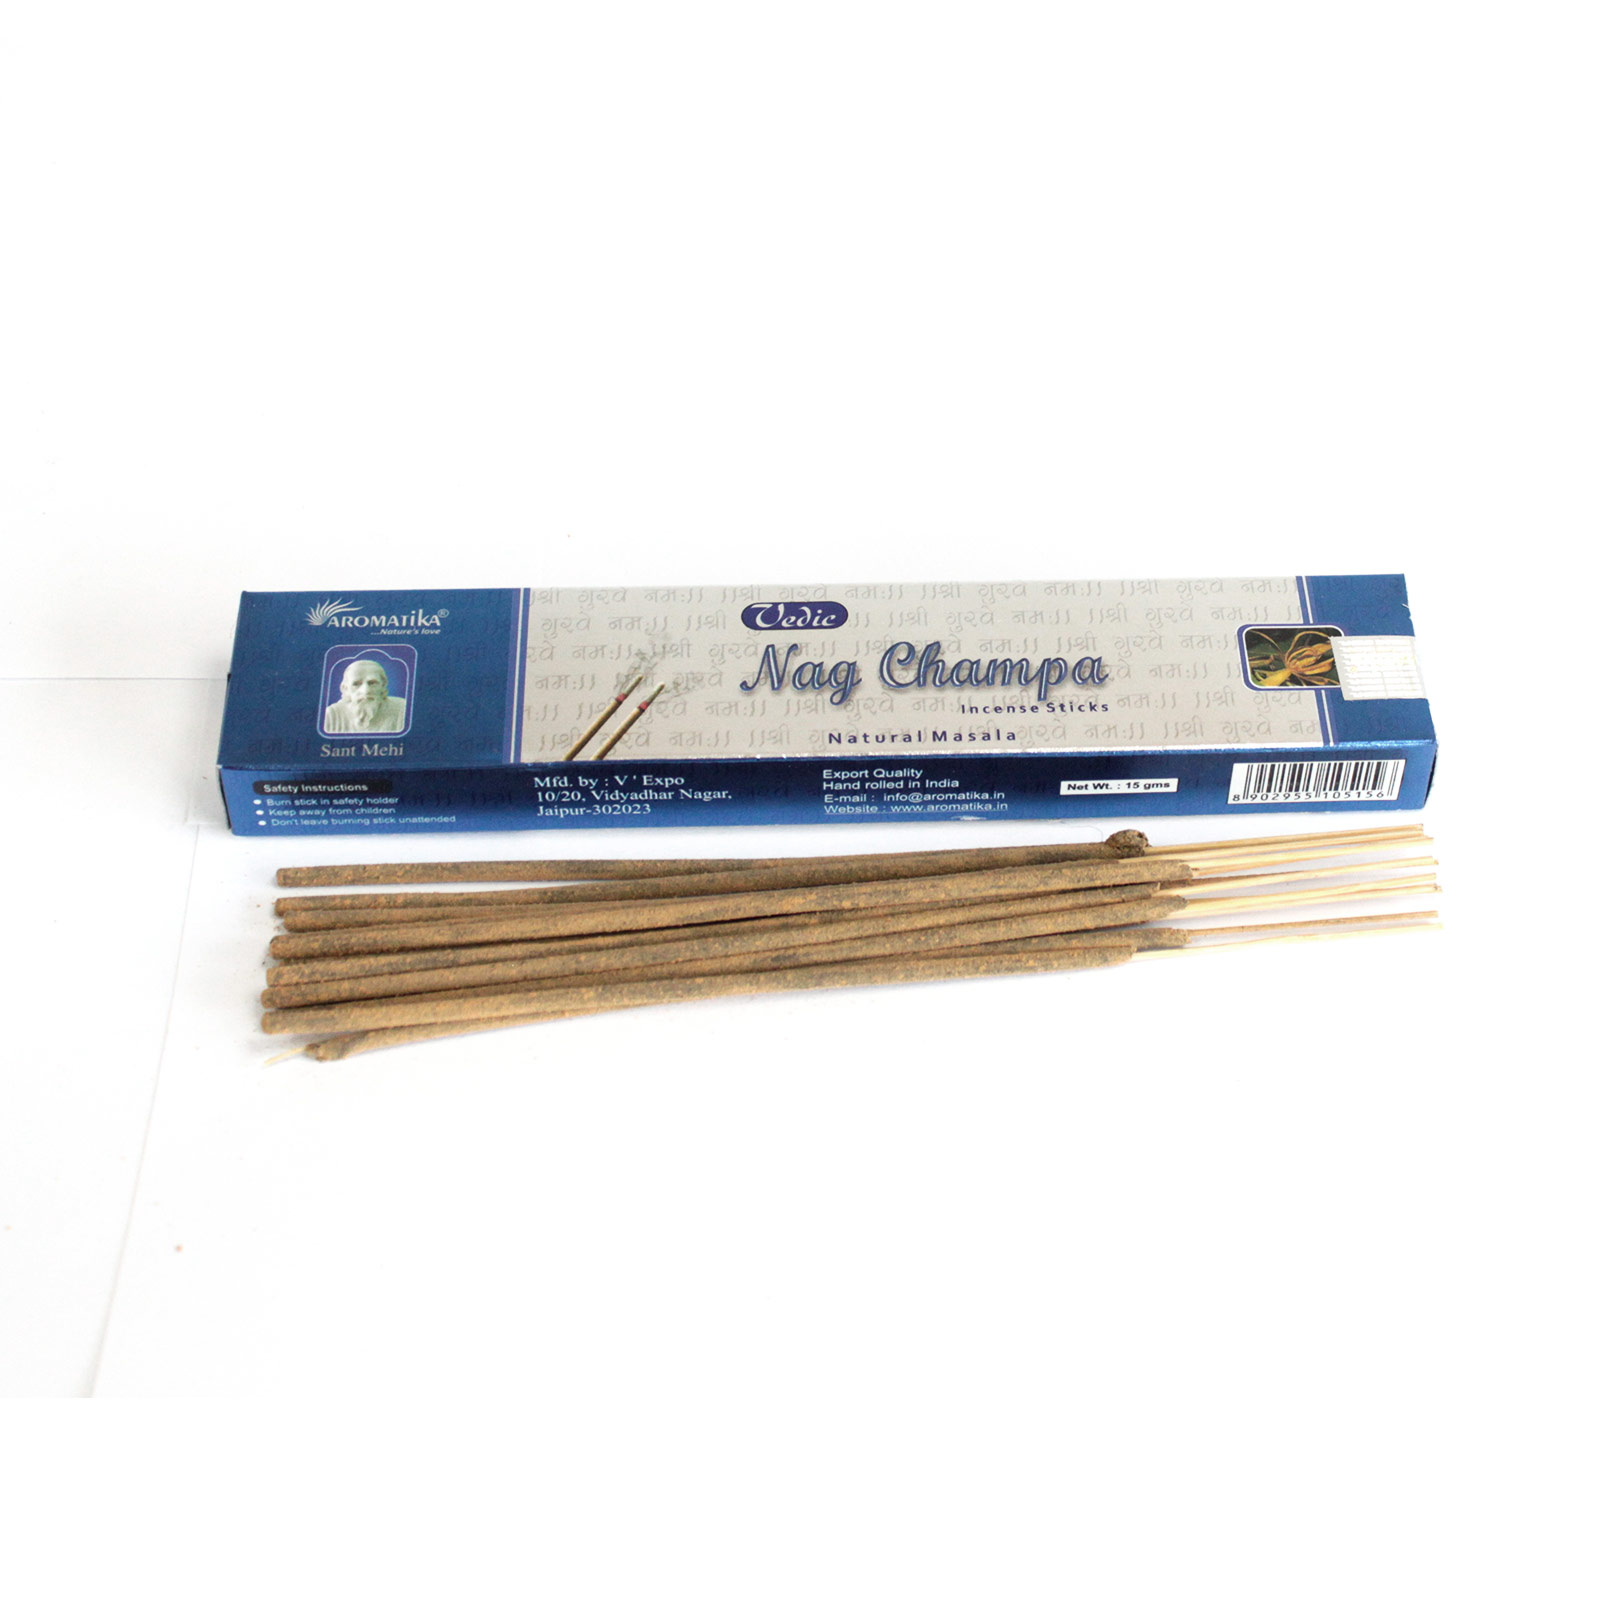 Vedic Incense Sticks - Nag Champa